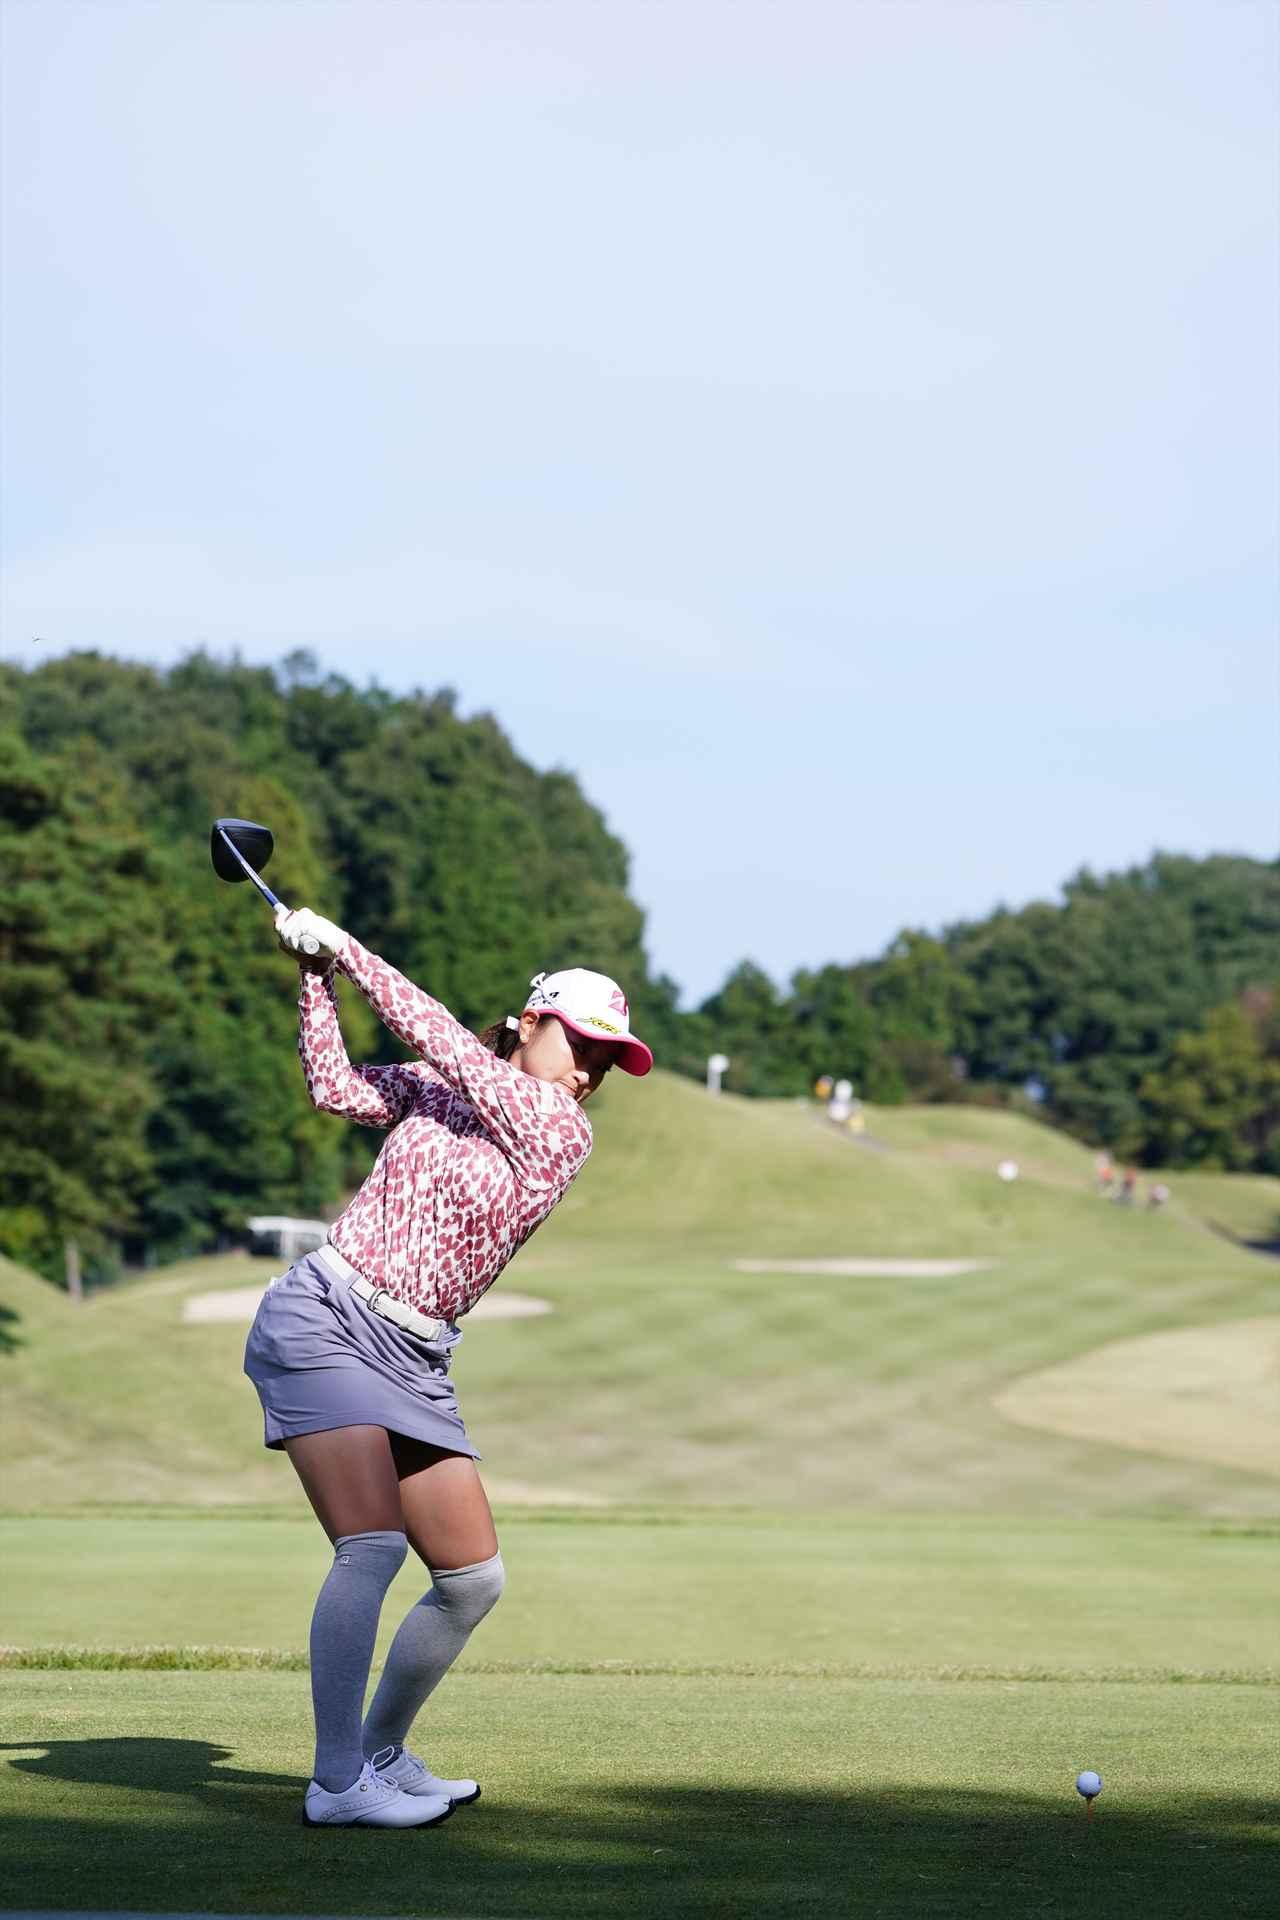 Images : 6番目の画像 - 高木優奈 ドライバー後方連続写真 - みんなのゴルフダイジェスト